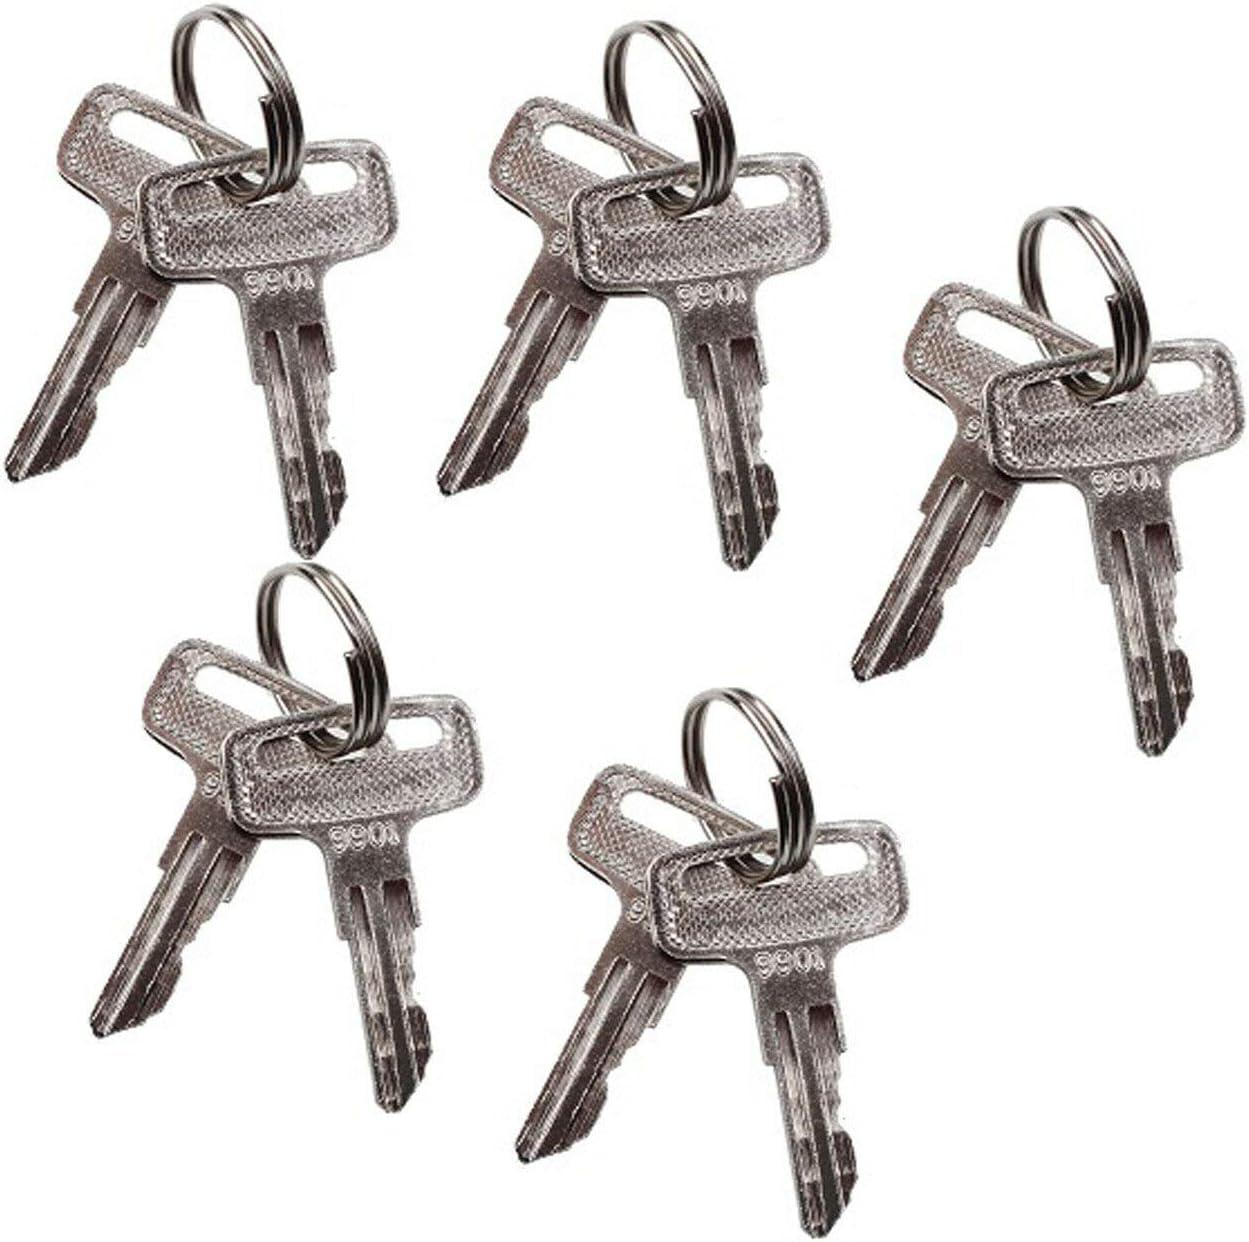 FridayParts 5 Pairs Ignition Key 9901 for JLG Manlift JLG Lifts 2033E3 1932E3 1532E2 1932E2 2632E2 3246E2 2032E2 2646ES